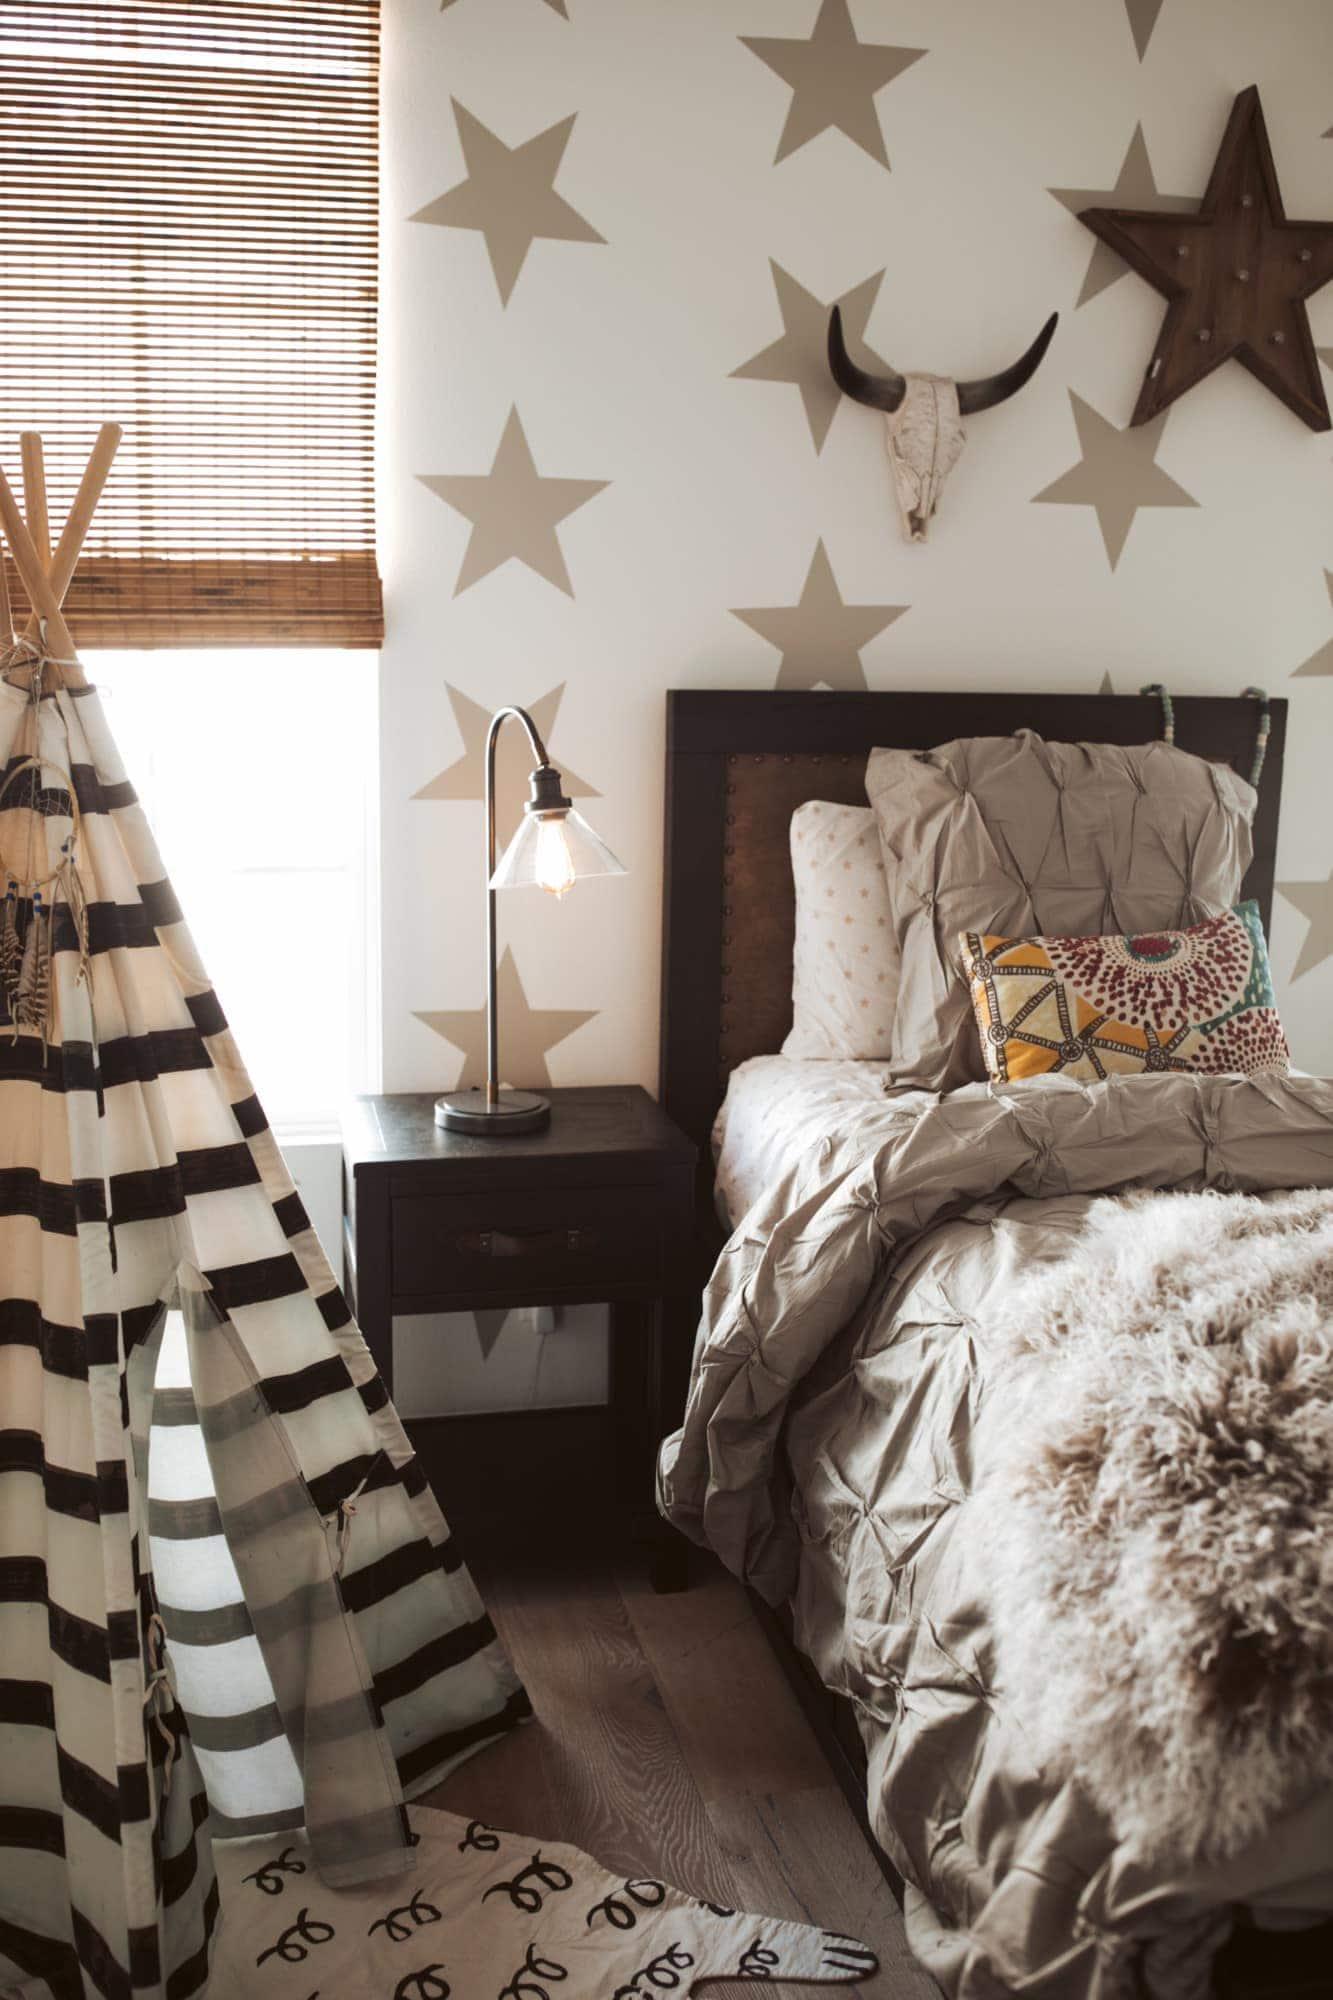 boy's bedroom with teepee